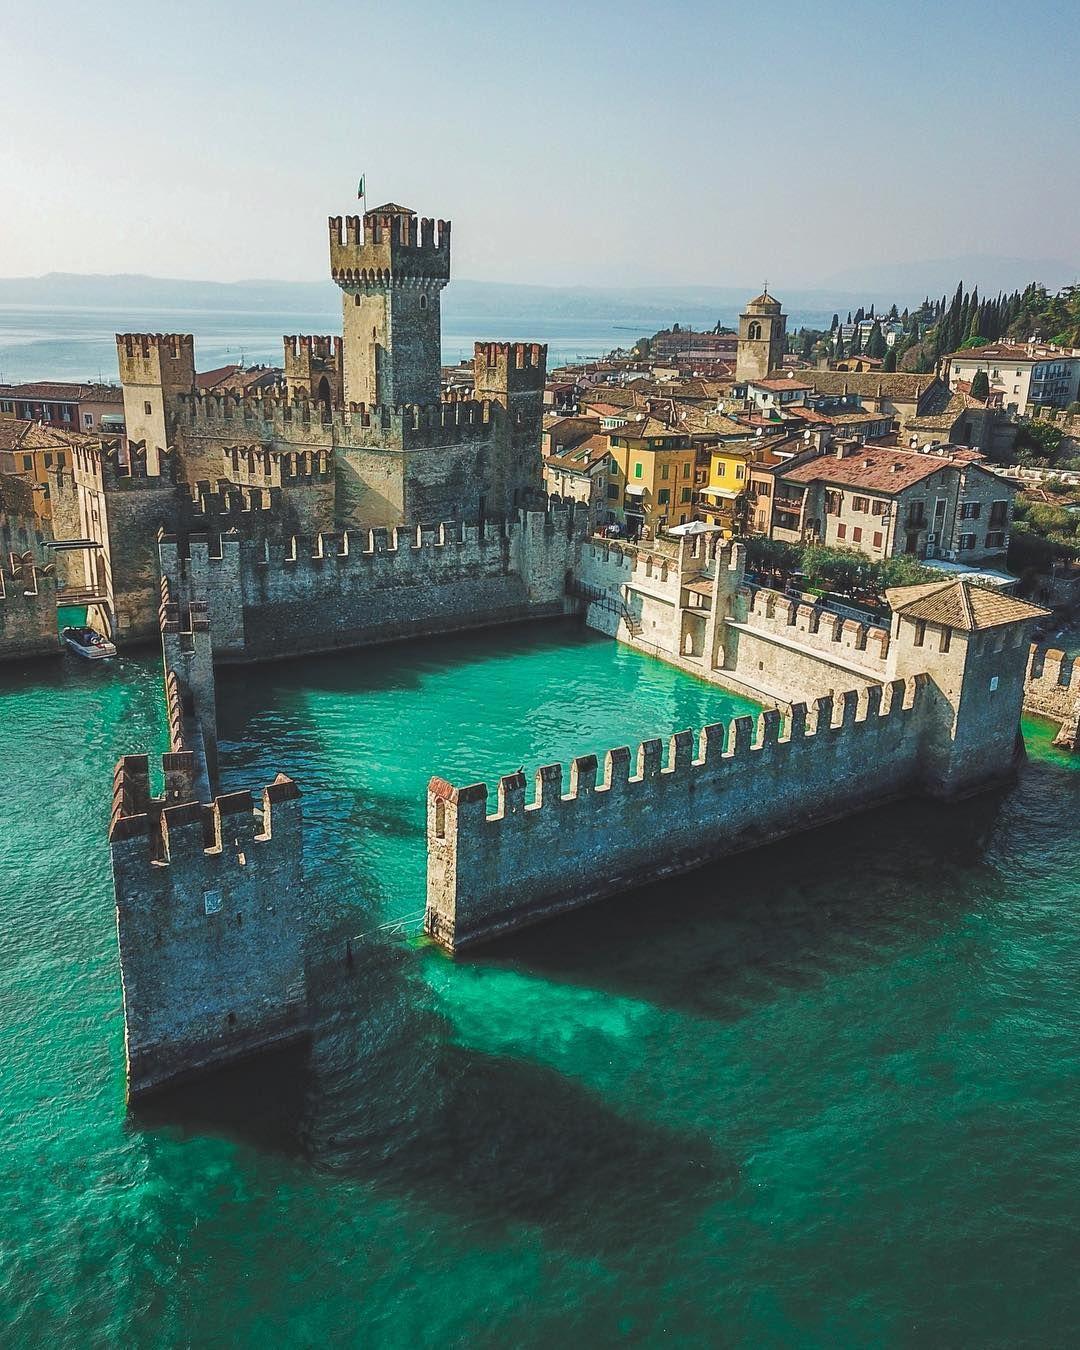 Castle in the water ✨ . . #wonderful_places  #beautifuldestinations  #bestplacestogo #sirmione  #castle  #castelliditalia  #sirmionecastle…